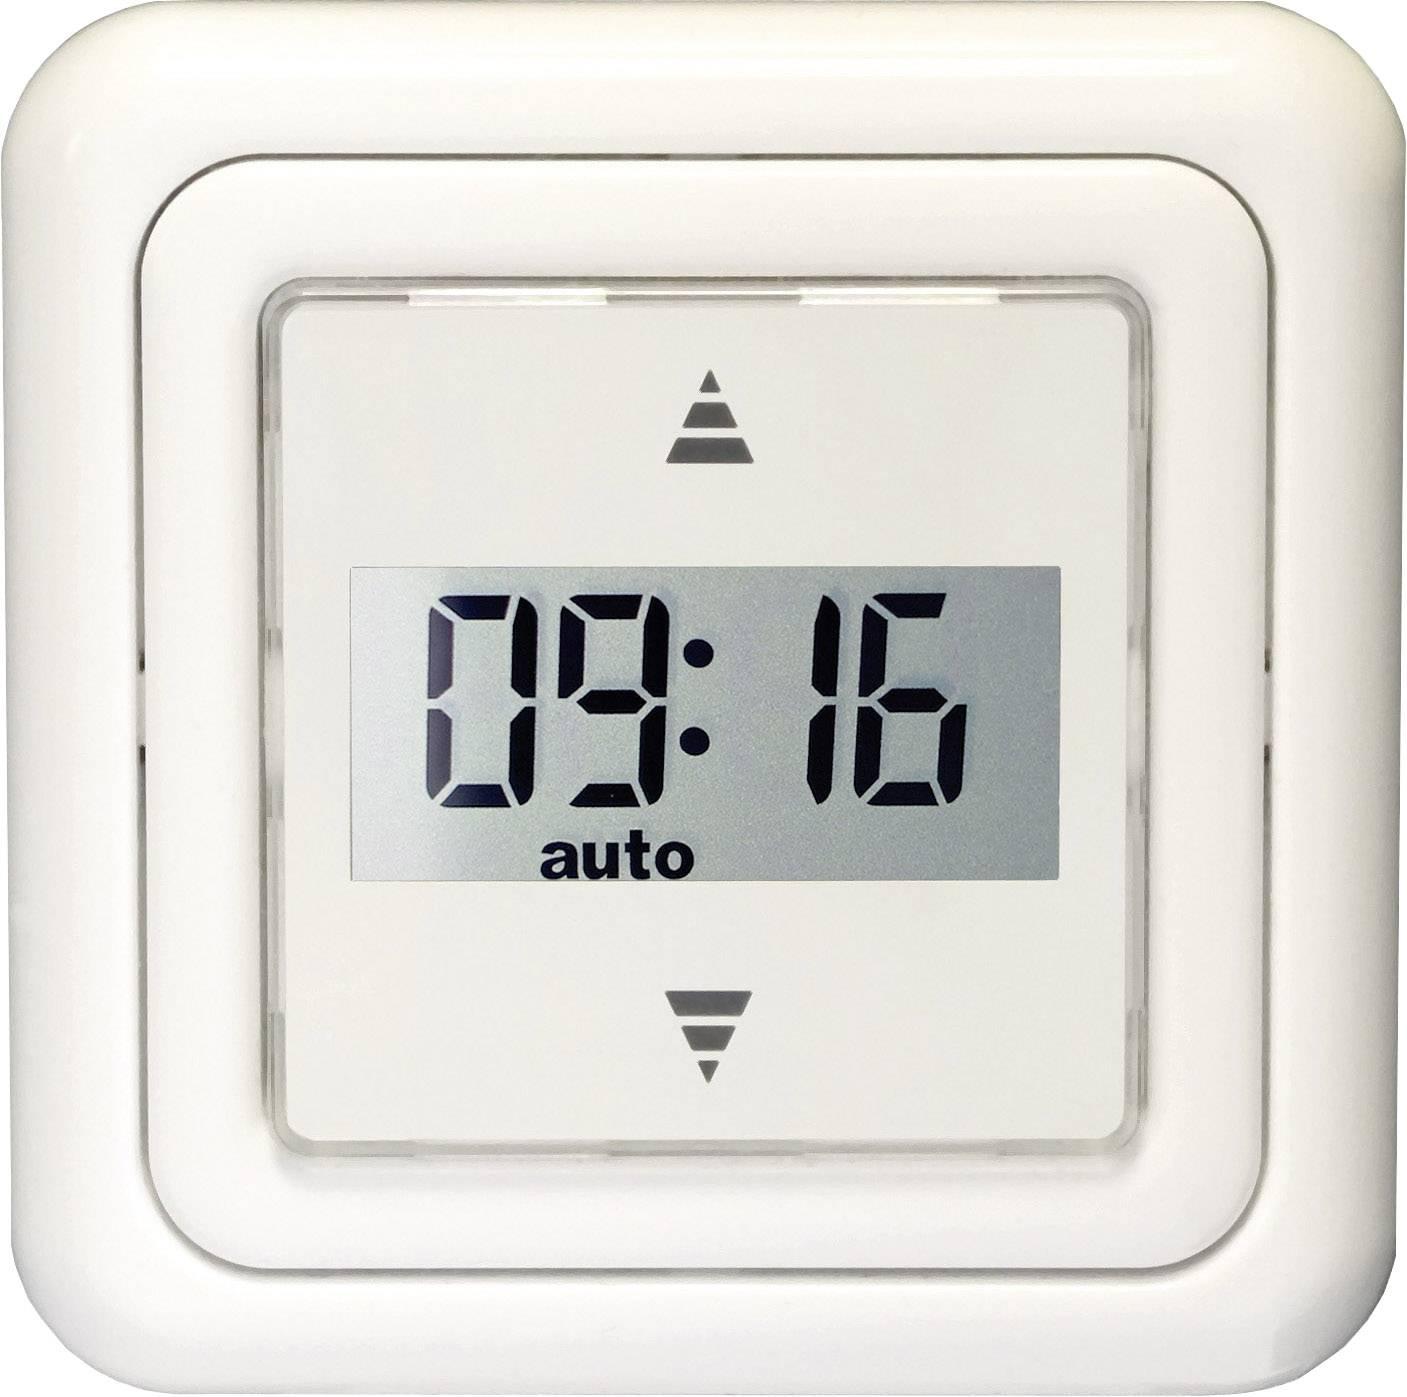 Ovládání rolet s LCD a časovačem Kaiser Nienhaus Tastor Mercato 320050